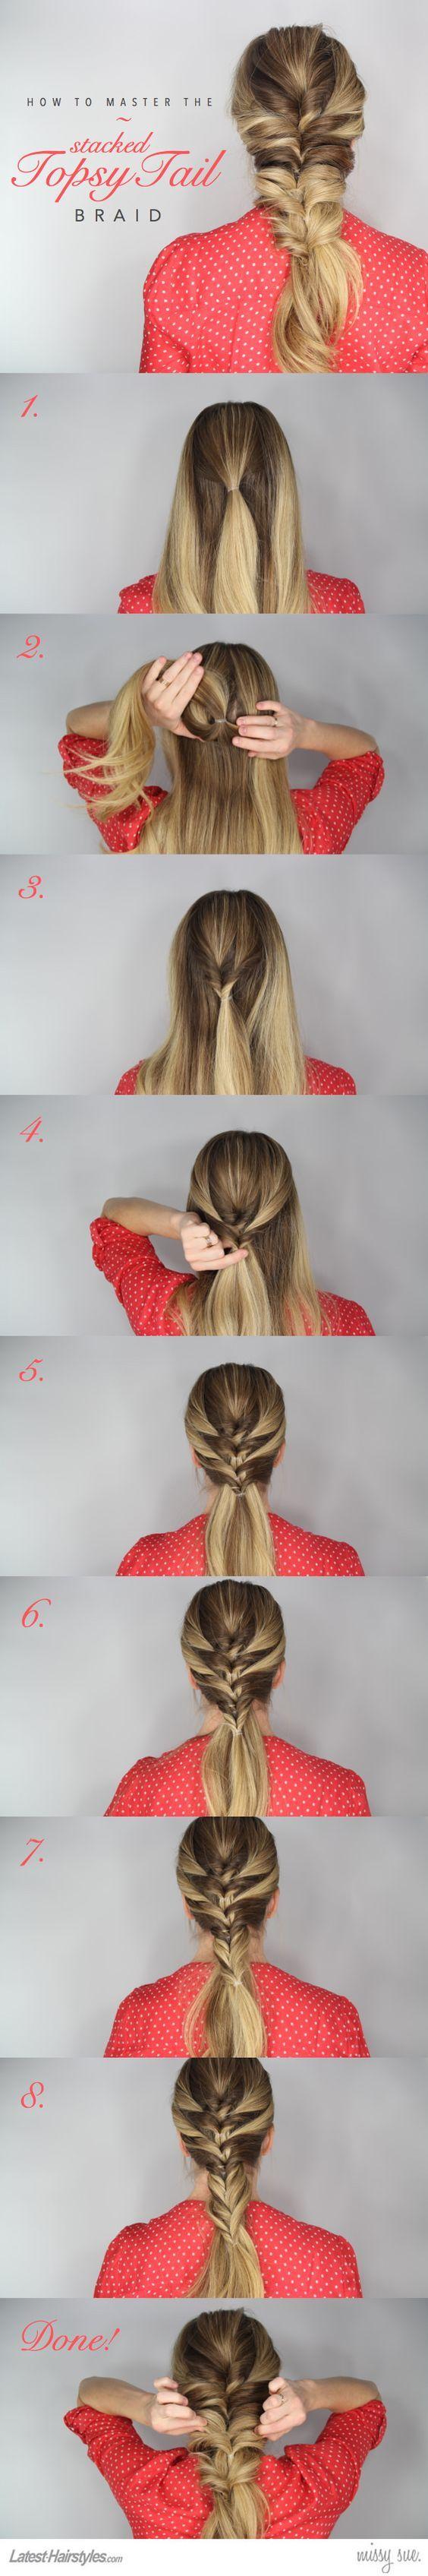 Super easy diy braided hairstyles for wedding tutorials hairstyles